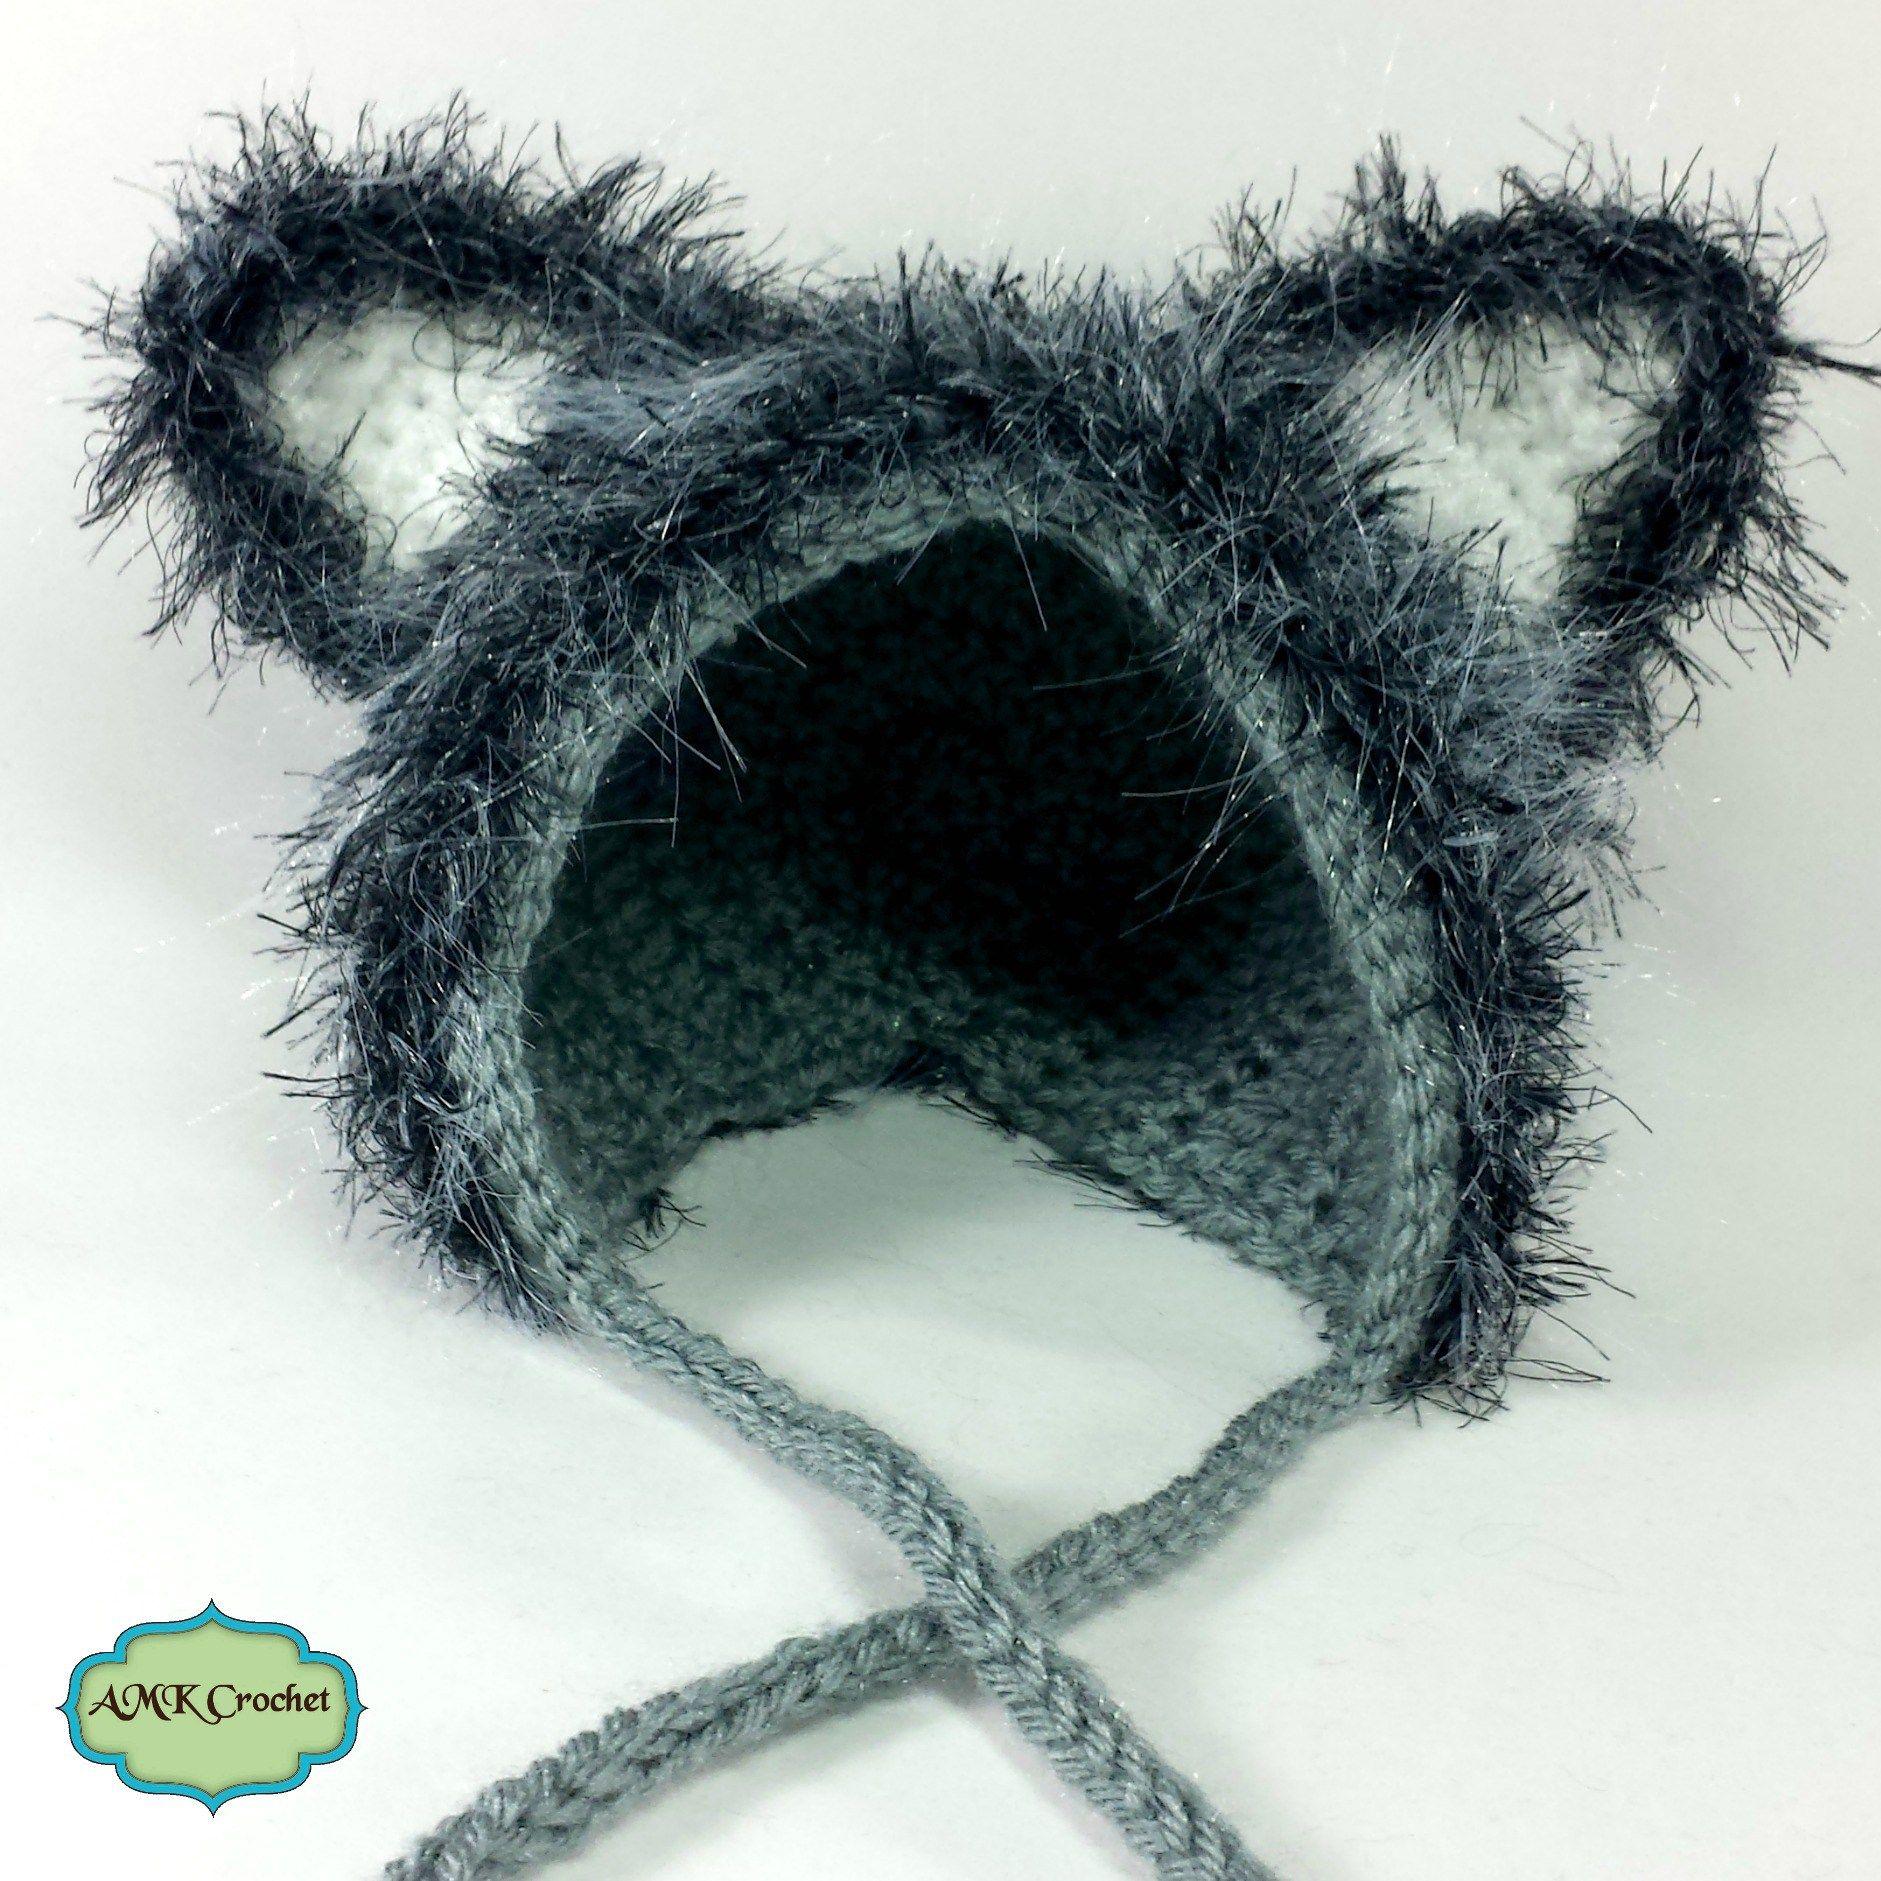 Crochet Newborn Bonnet Style Wolf Hat Pattern by AMKCrochet.com ... 3cc94d614bc